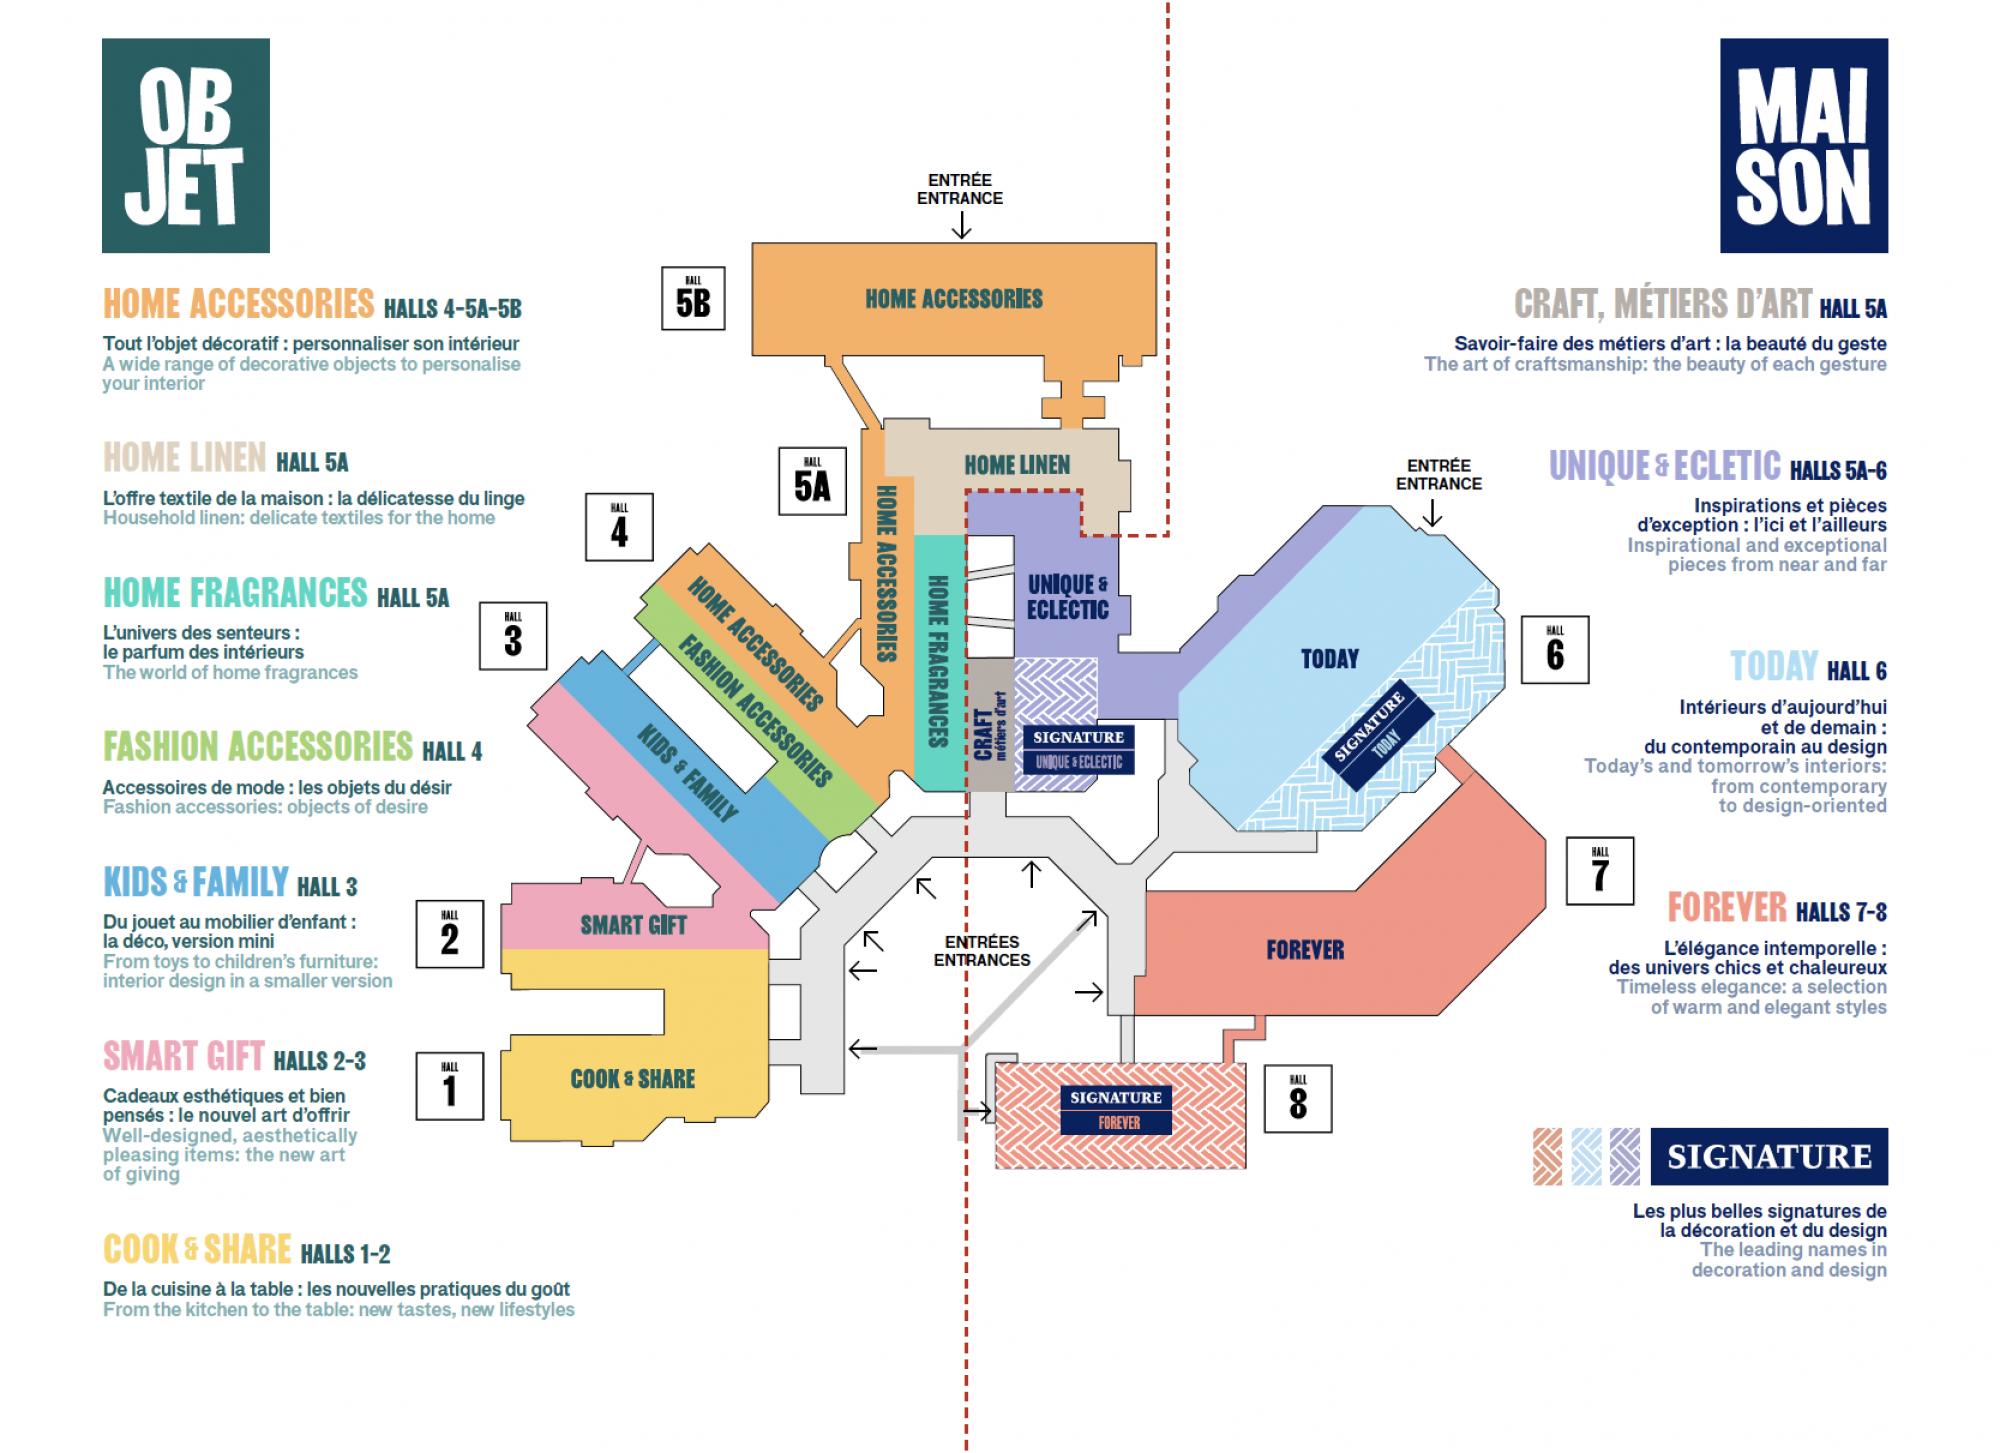 Maison Et Objet Paris 18 22 January 2019 Floorplan Linking Maker And Market